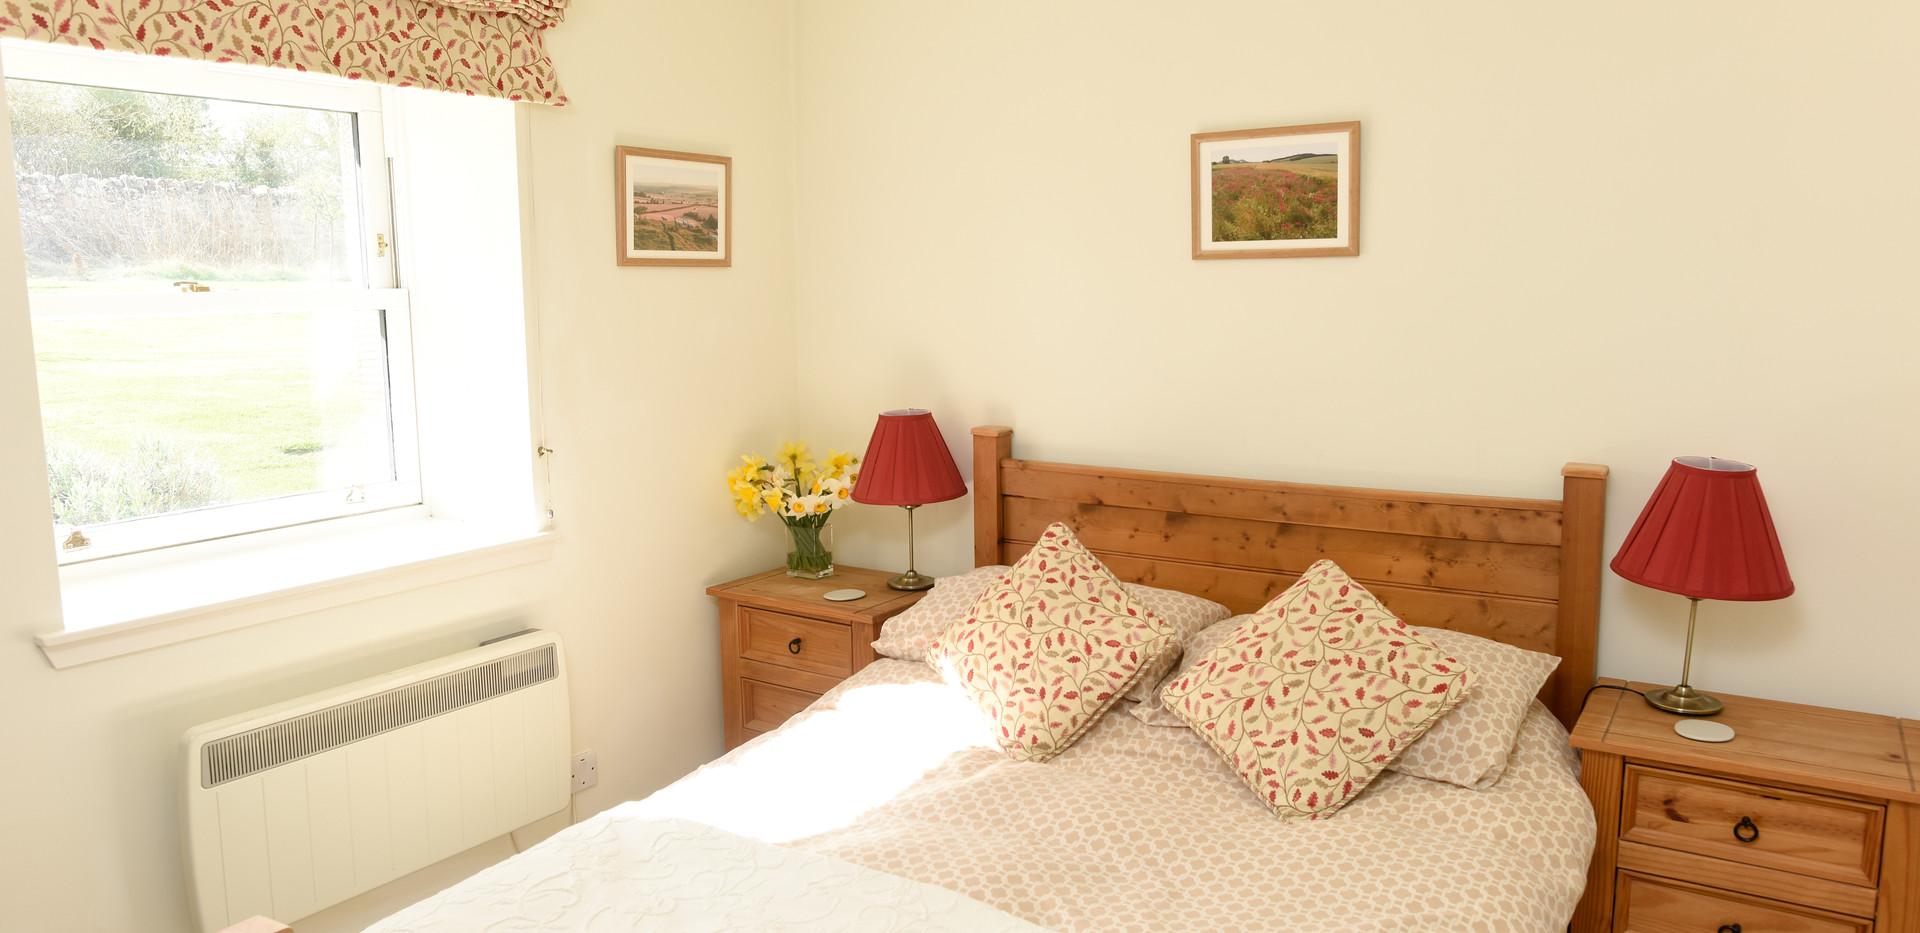 Overview - WB bedroom.jpg